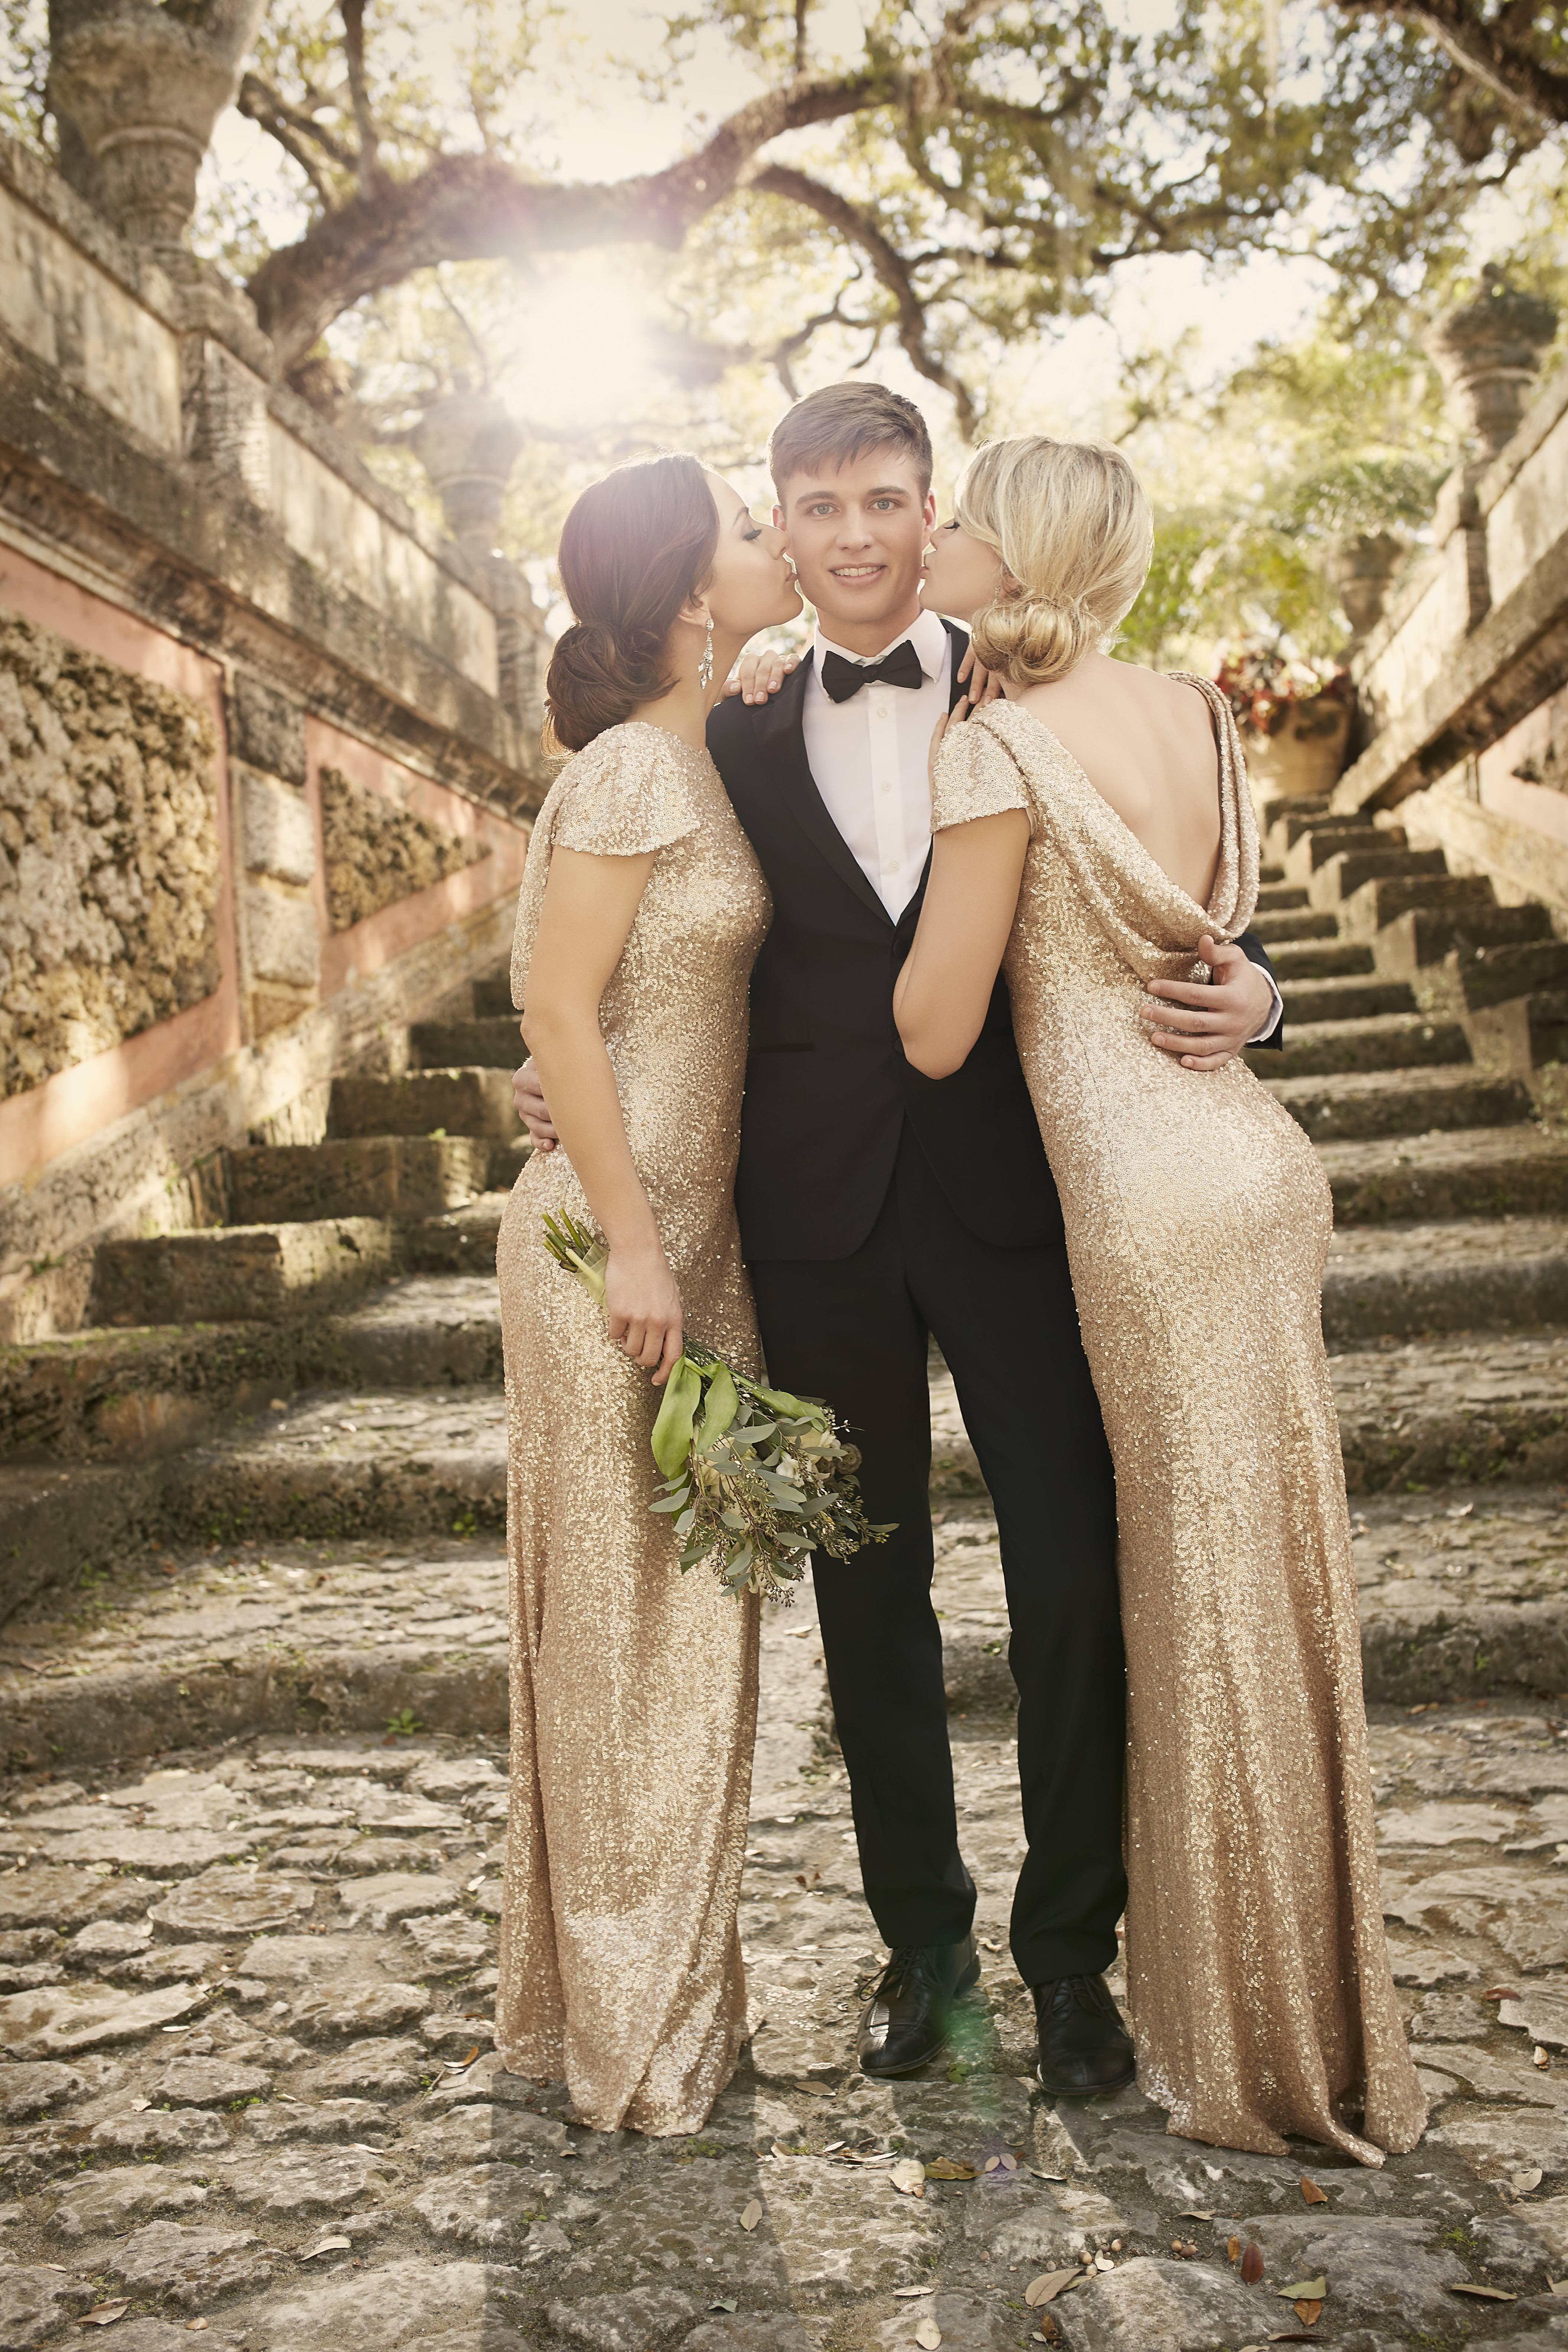 Hollywood wedding theme